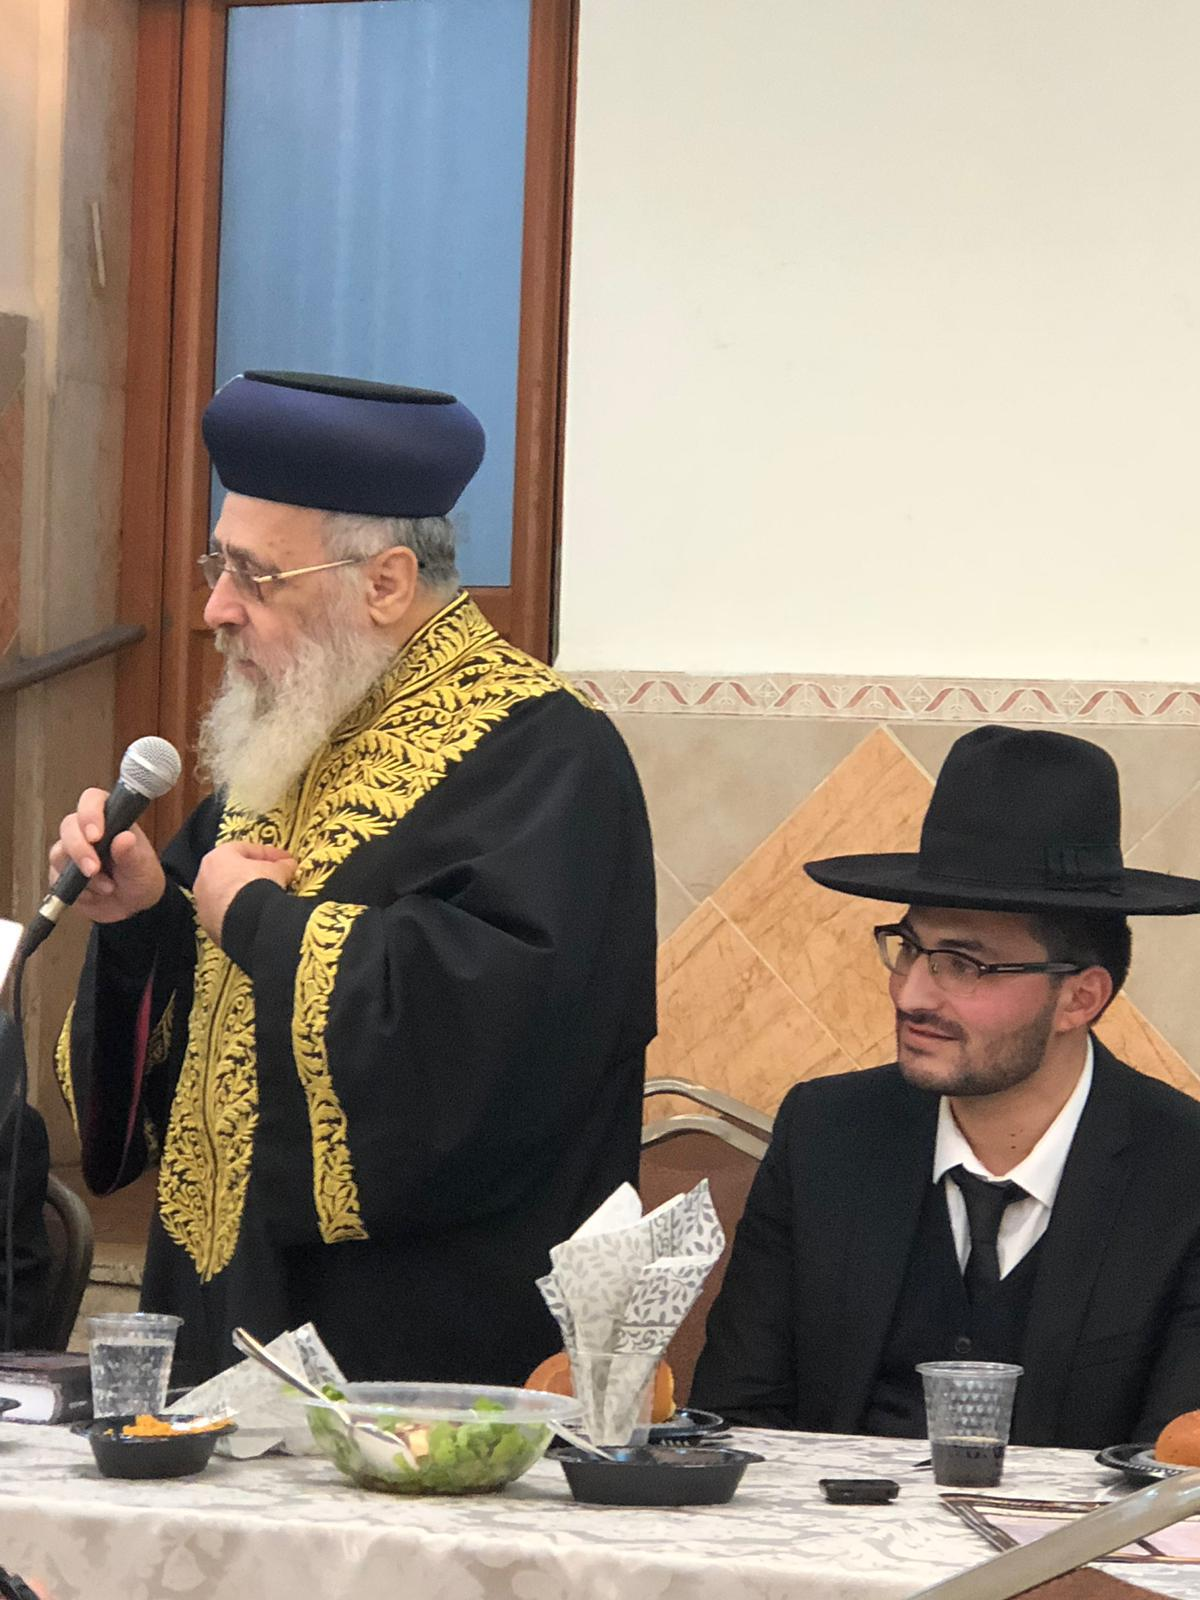 Le Omer - Cours hebdomadaire du Rishon Letsione Marane Rav Itshak Yossef Shalita du 27 Avril 2019